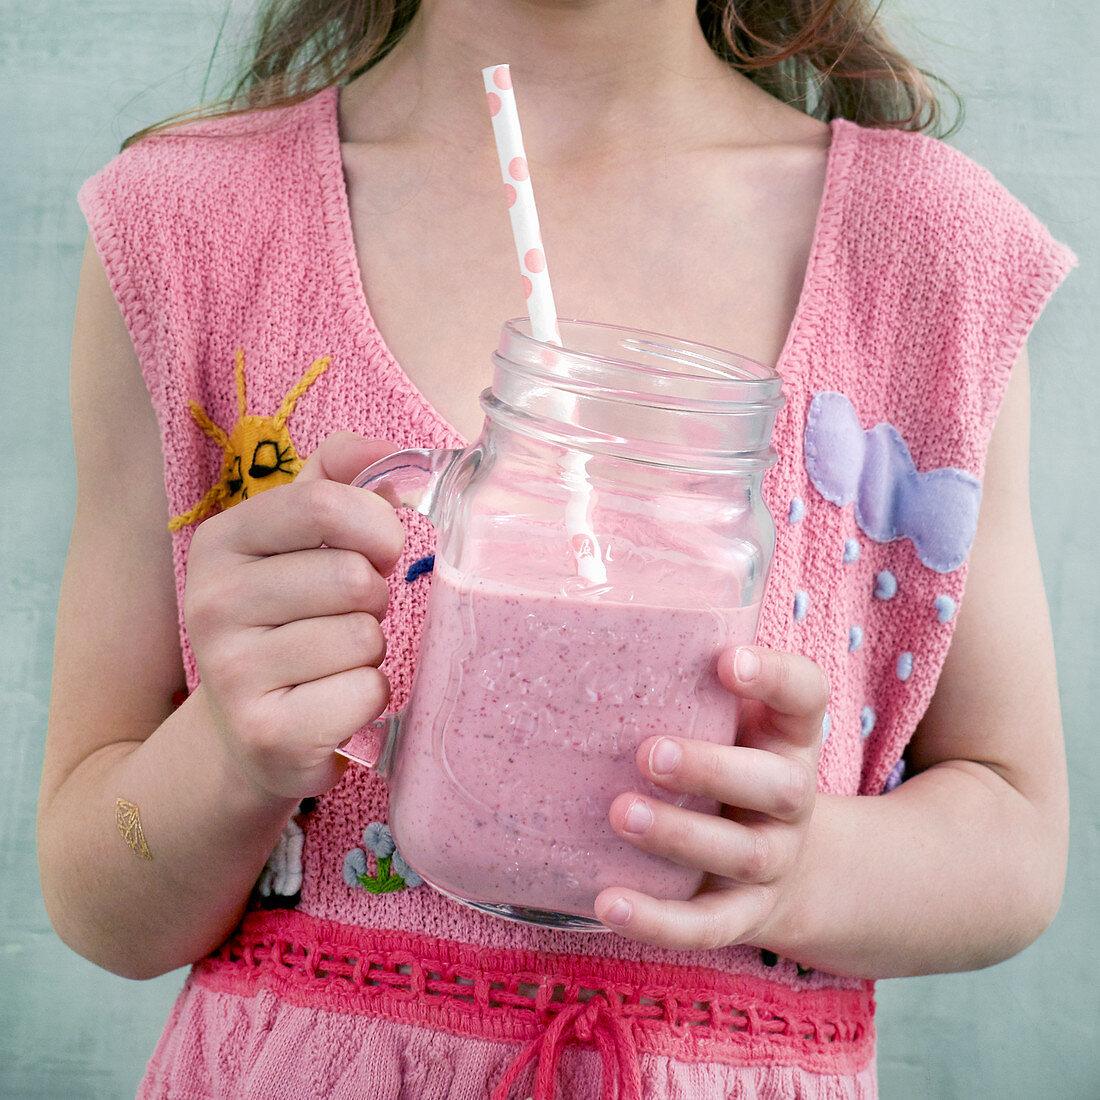 Raspberry smoothie